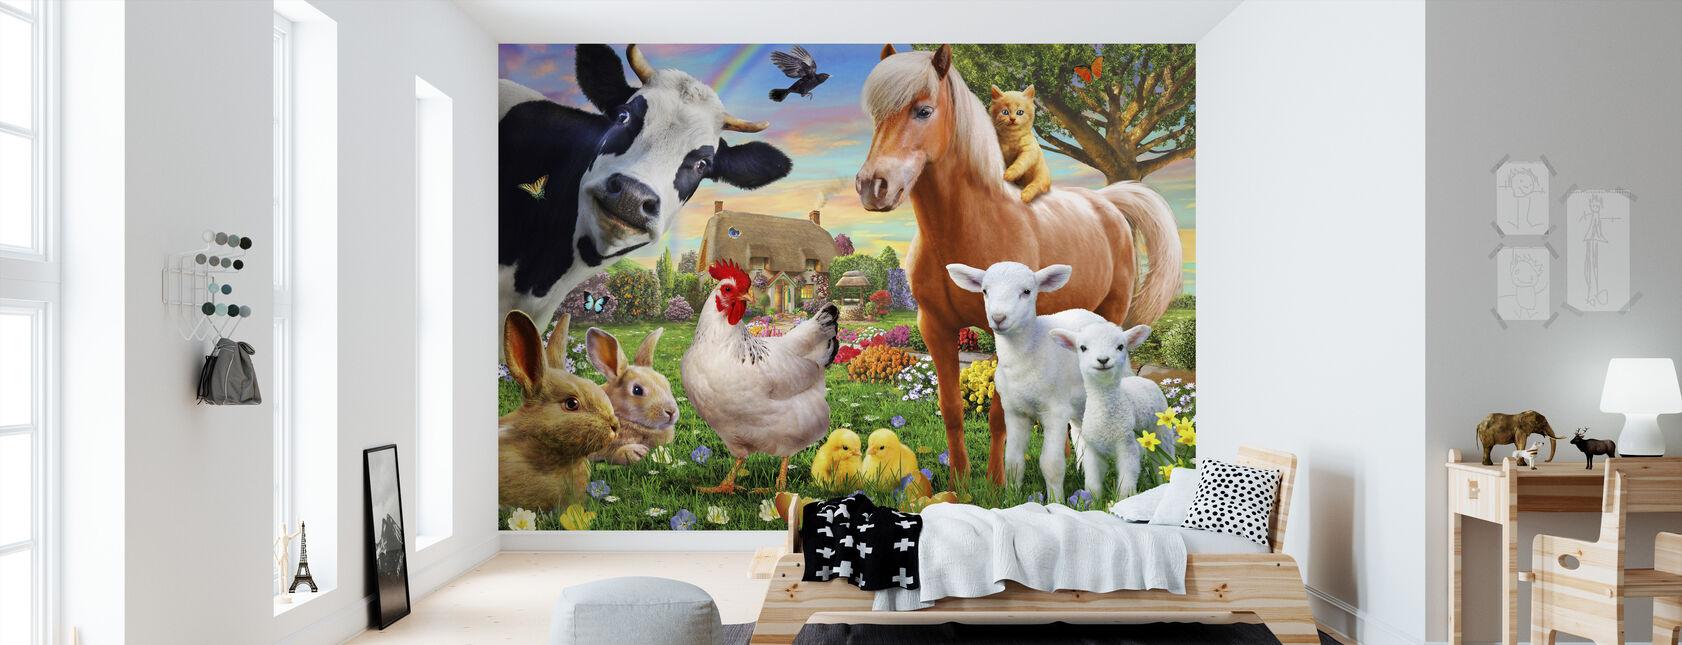 Farm Animals for kids - Wallpaper - Kids Room